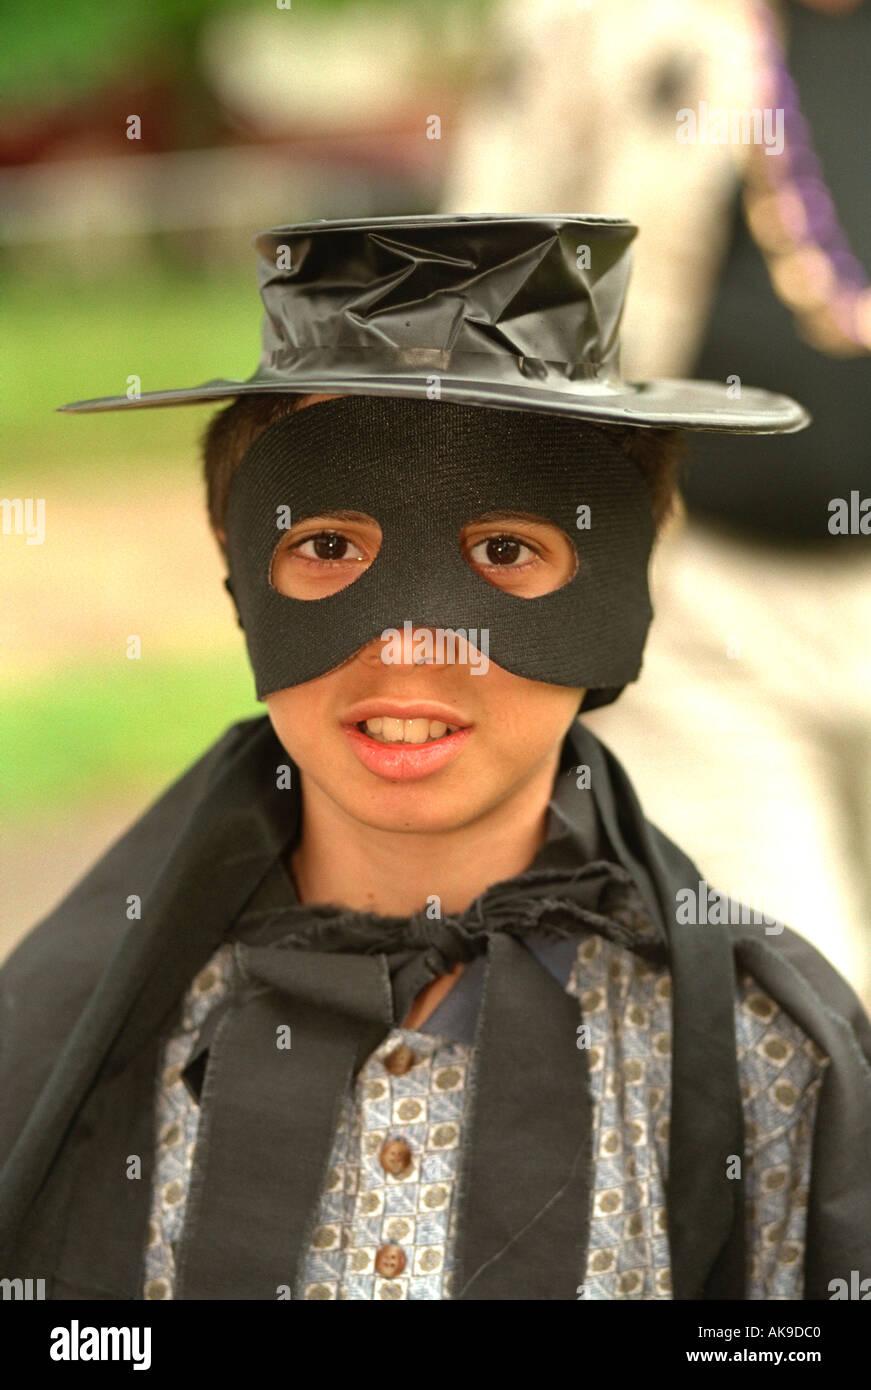 Zoro performer age 12 at Parktacular Parade. St Louis Park Minnesota USA - Stock Image